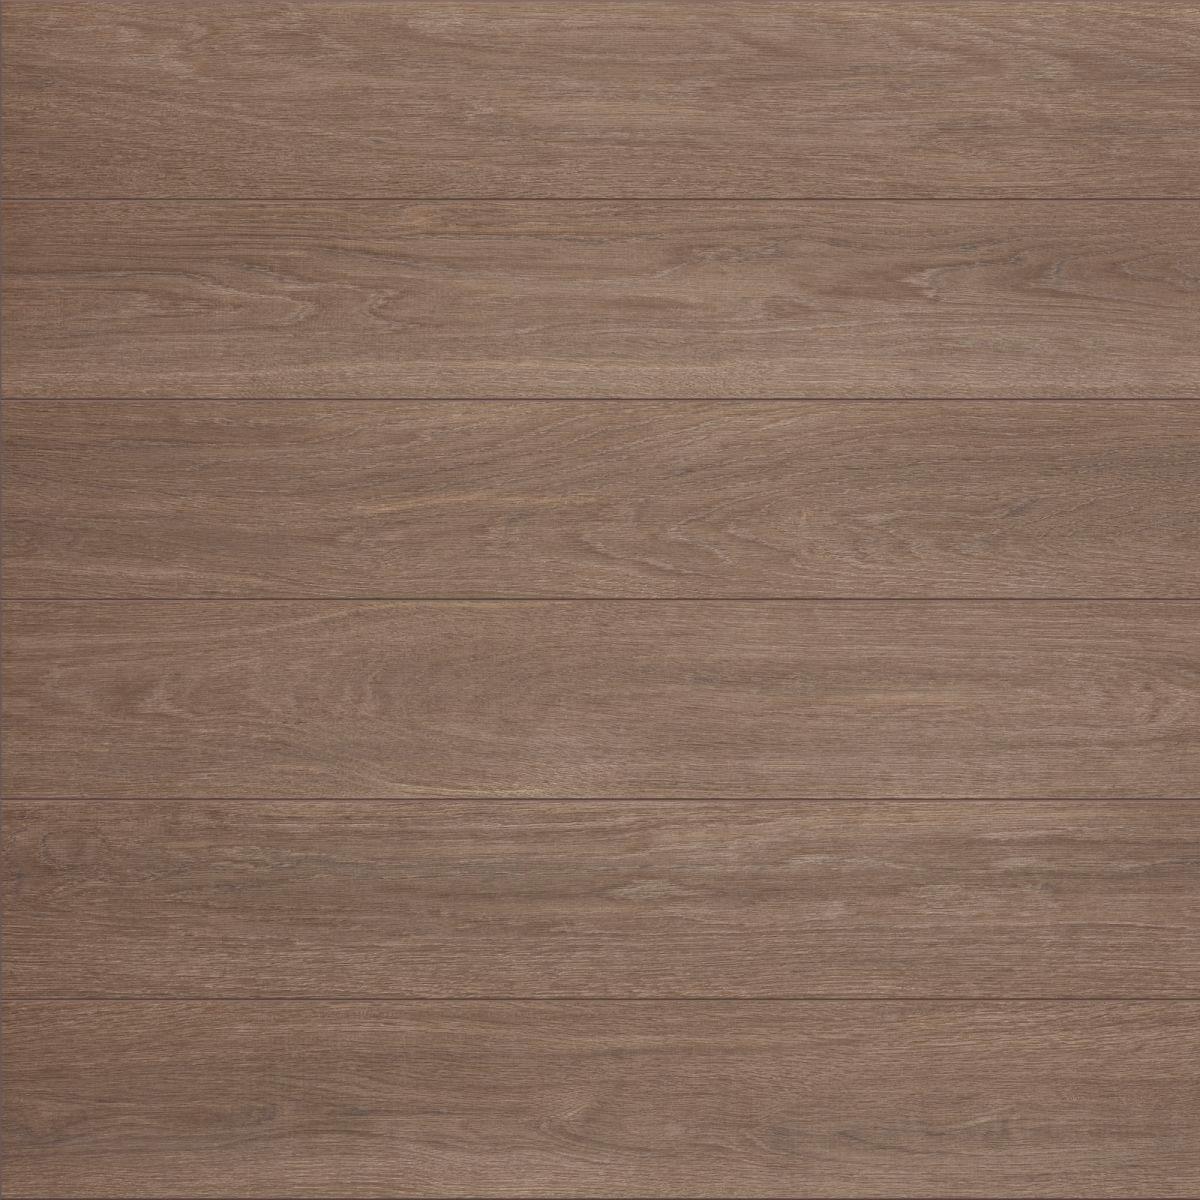 Classen Ламинат Pool 833-4 52561 Дуб dark brown